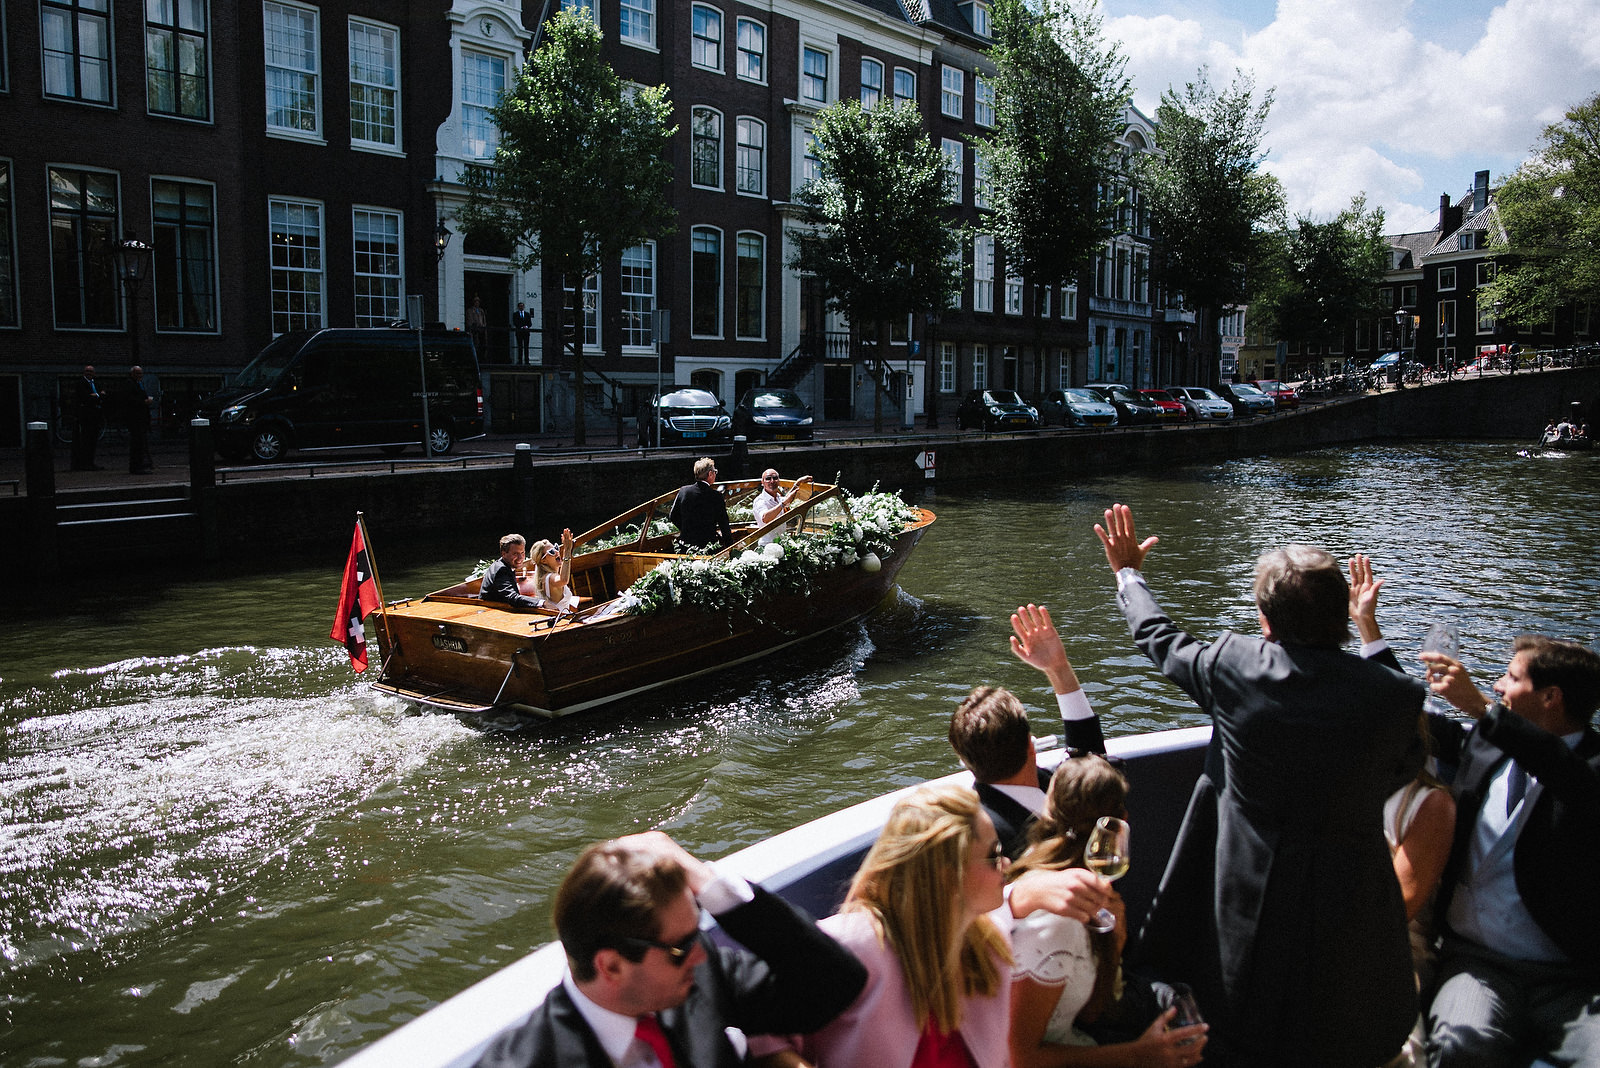 Fotograf Konstanz - Destination Wedding Photographer Amsterdam 065 - Destination Wedding Amsterdam  - 174 -